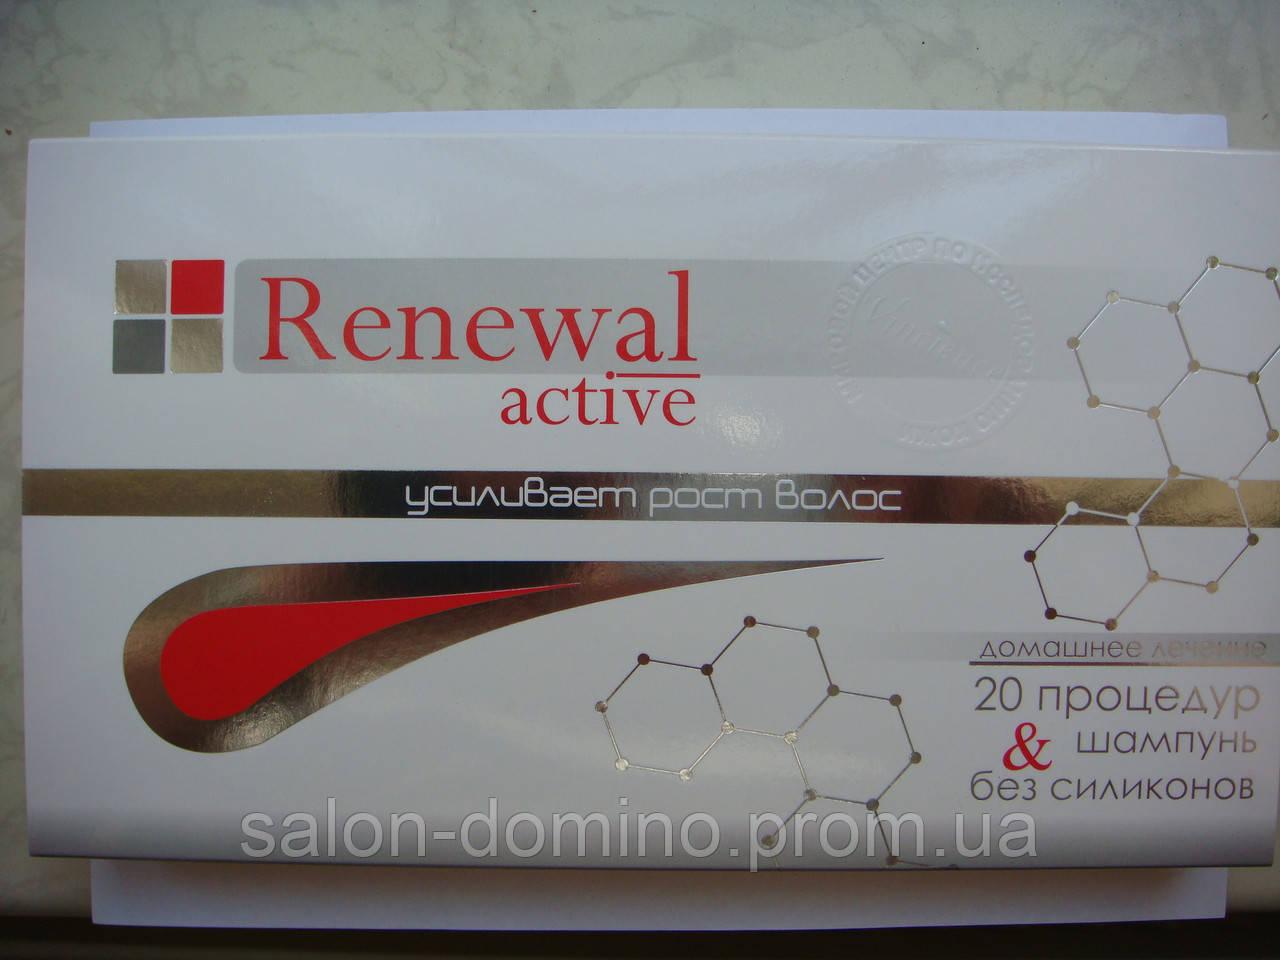 renewal active